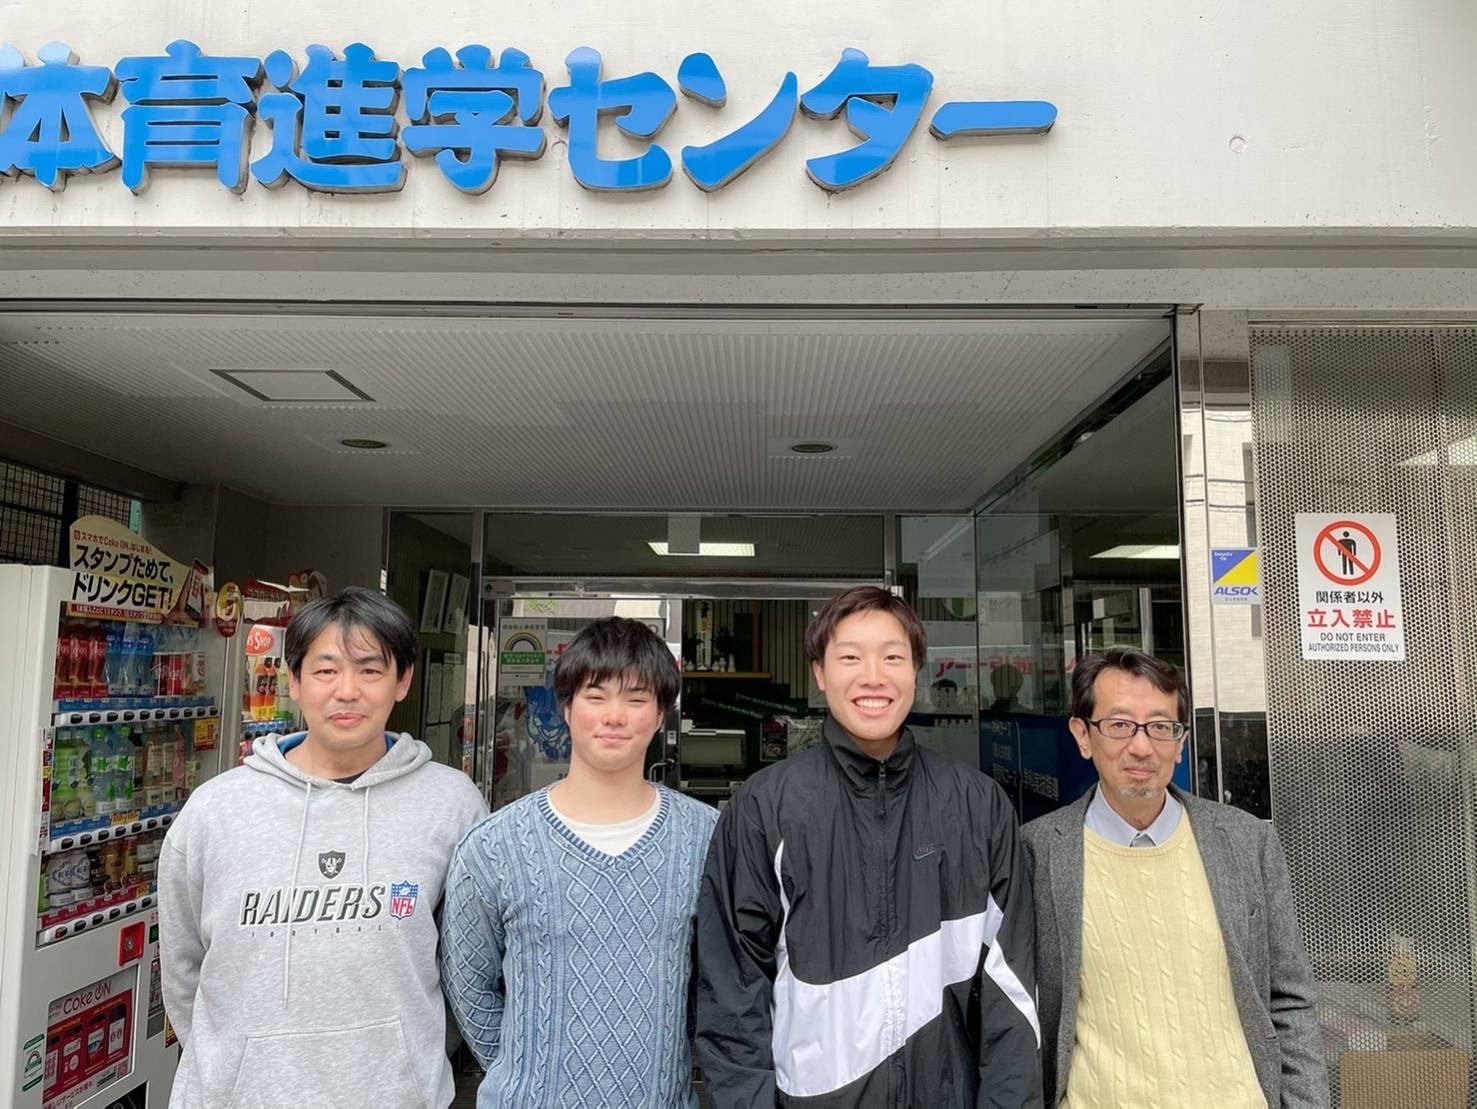 http://www.e-taishin.com/diary/img/1_1_20210315_mizu.jpg